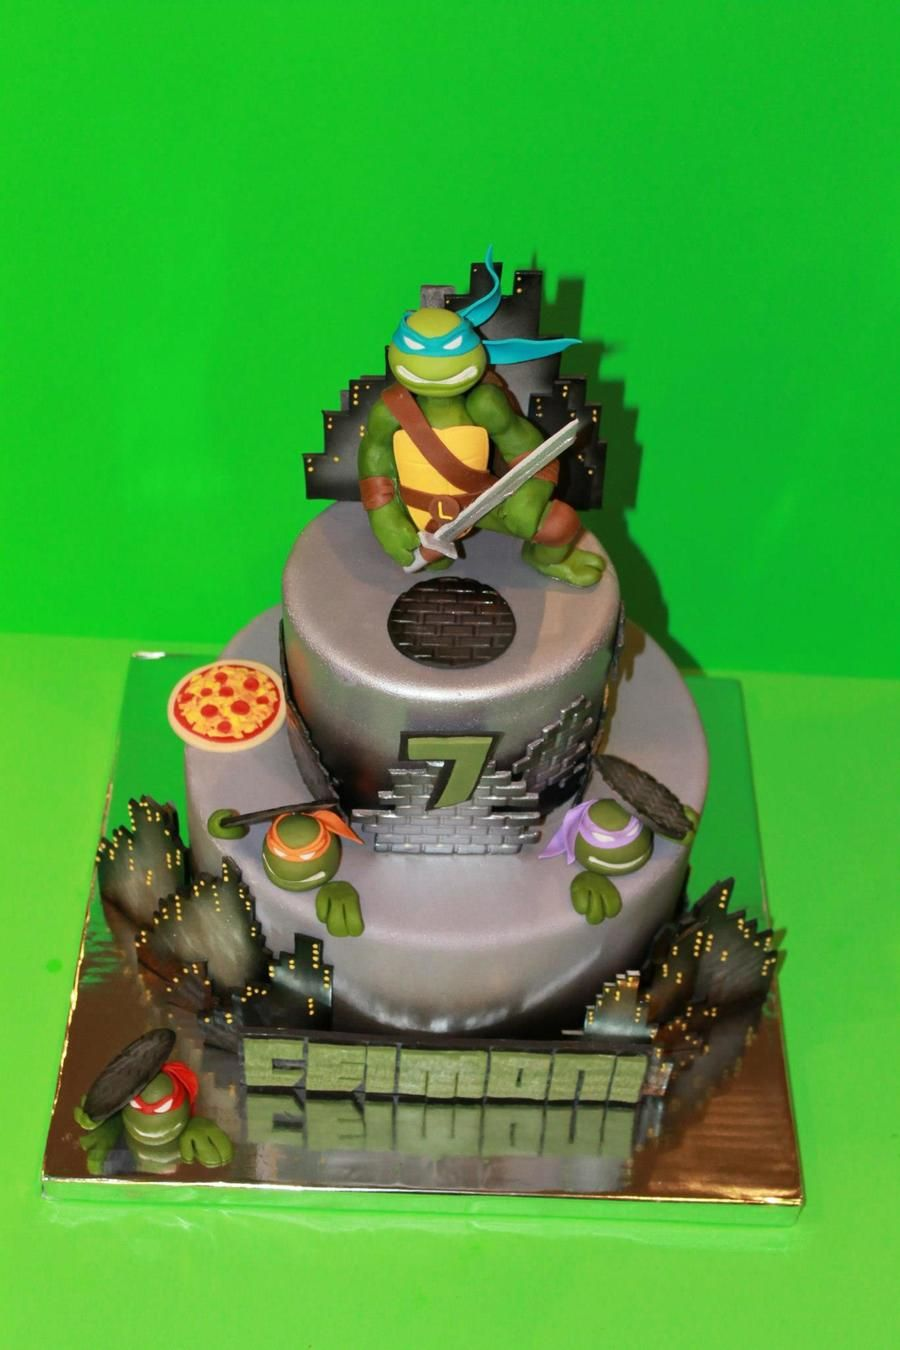 Teenage Mutant Ninja Turtle Cake Tmnt Cake Cake Is Completely Edible And Hand Sculpted Perfect For This 7 Year Old B Turtle Cake Ninja Turtle Cake Tmnt Cake